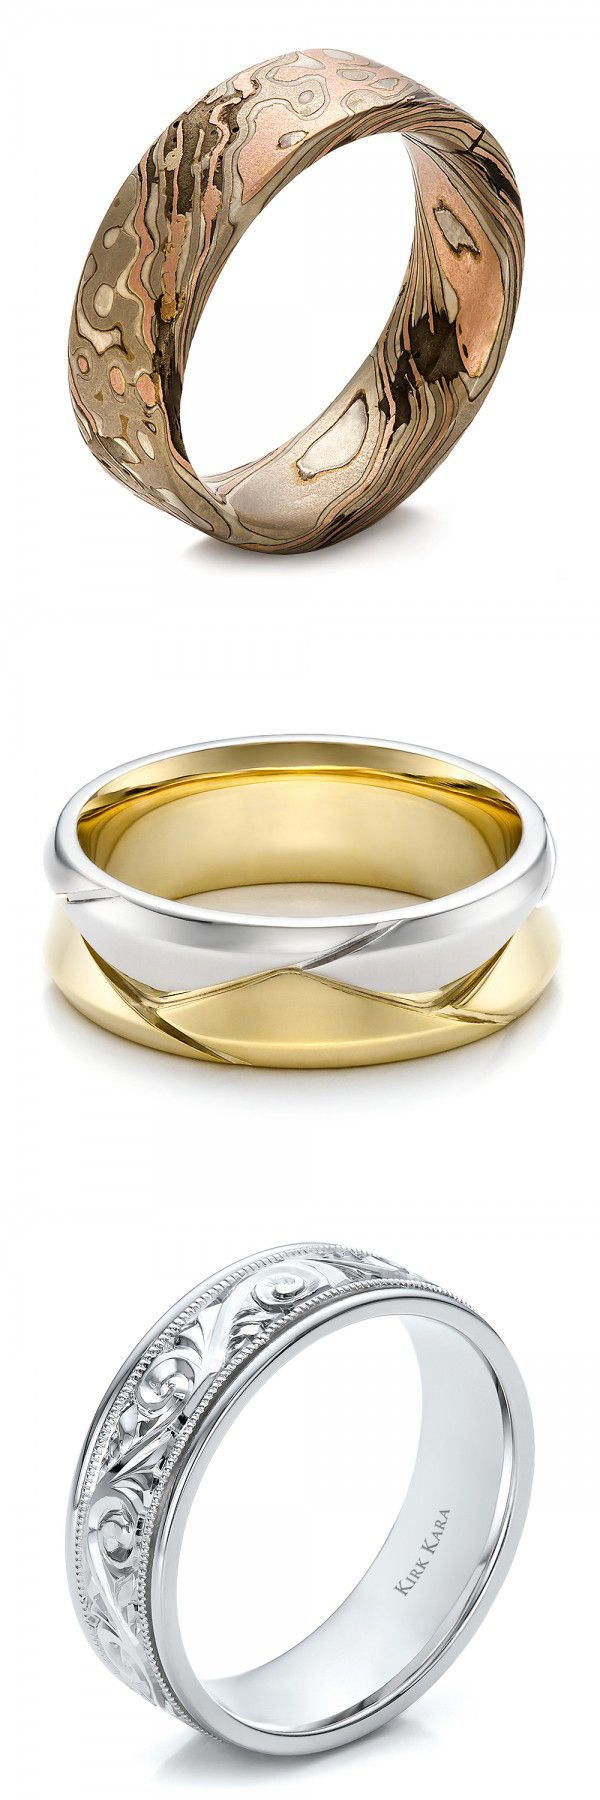 Mens wedding rings from Joseph Jewelry. #groom #rings #weddingbands https://www.josephjewelry.com/mens-wedding-rings?&sort=popular